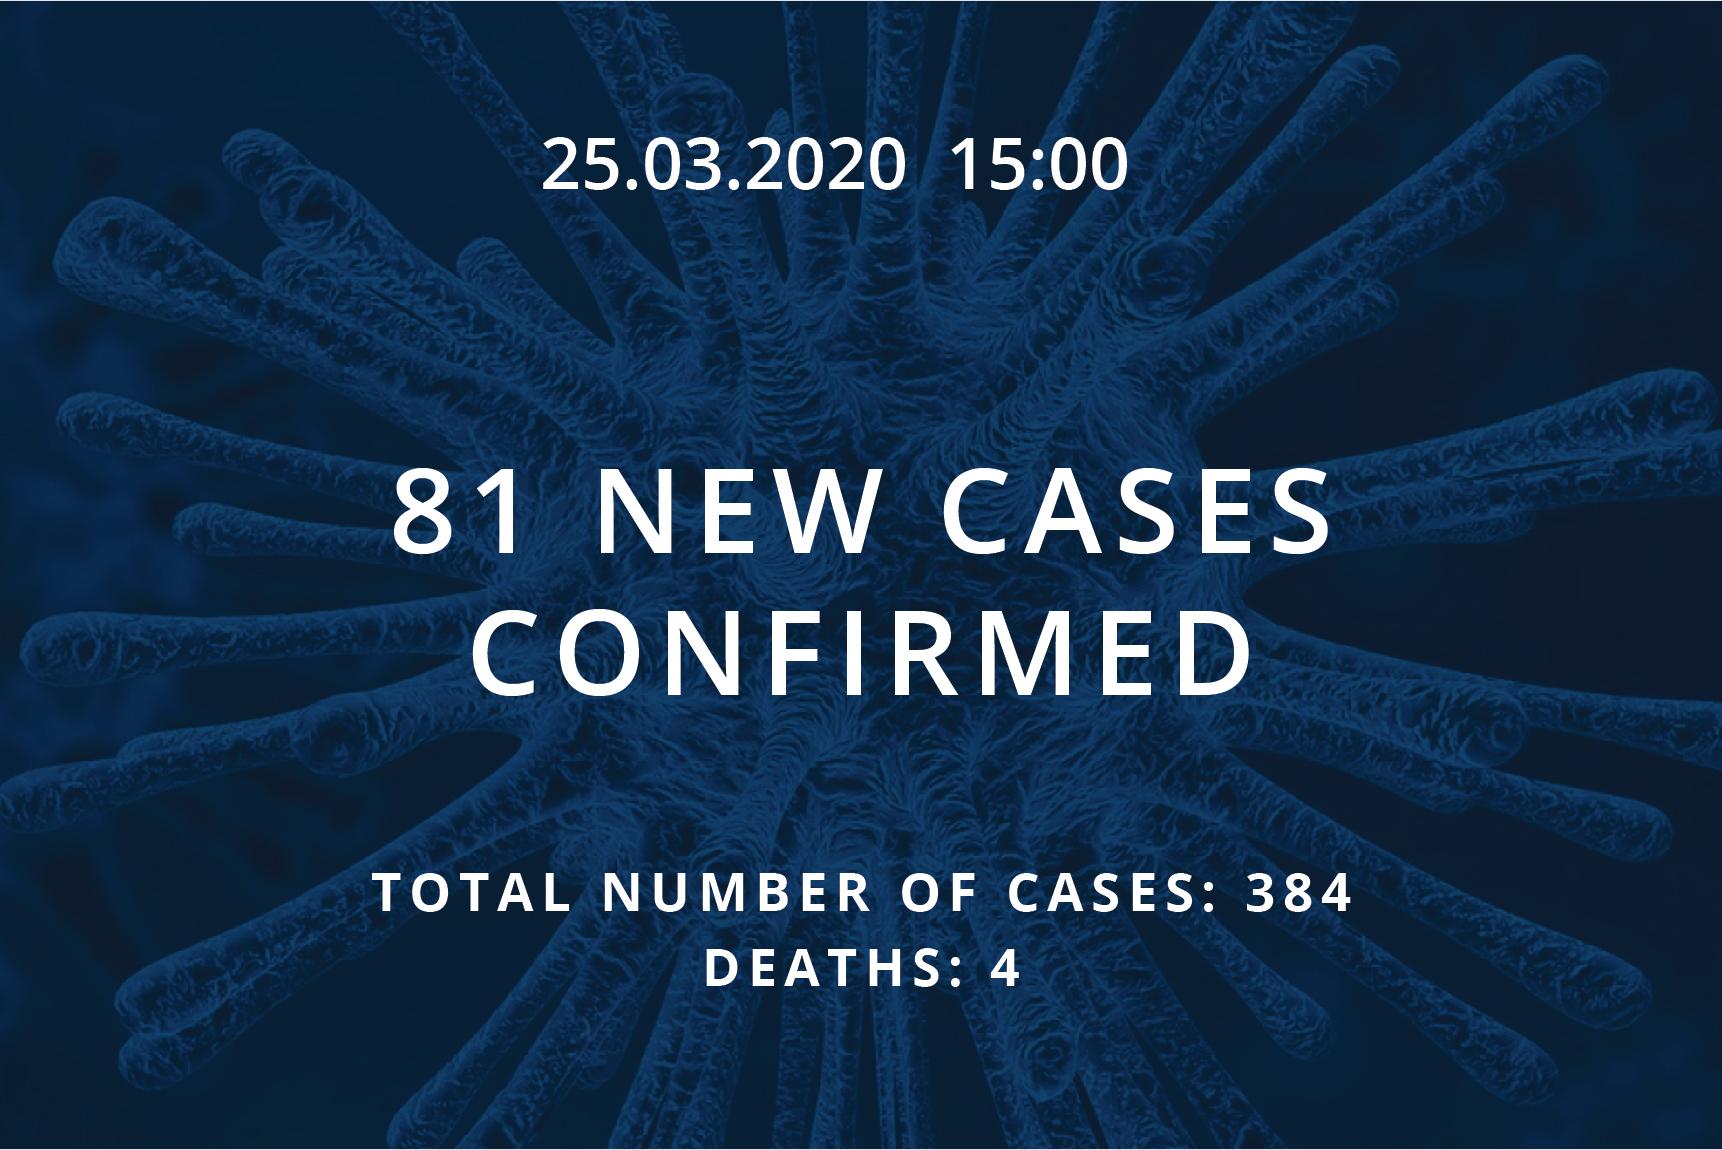 Information about coronavirus COVID-19, 25.03.2020 at 15:00